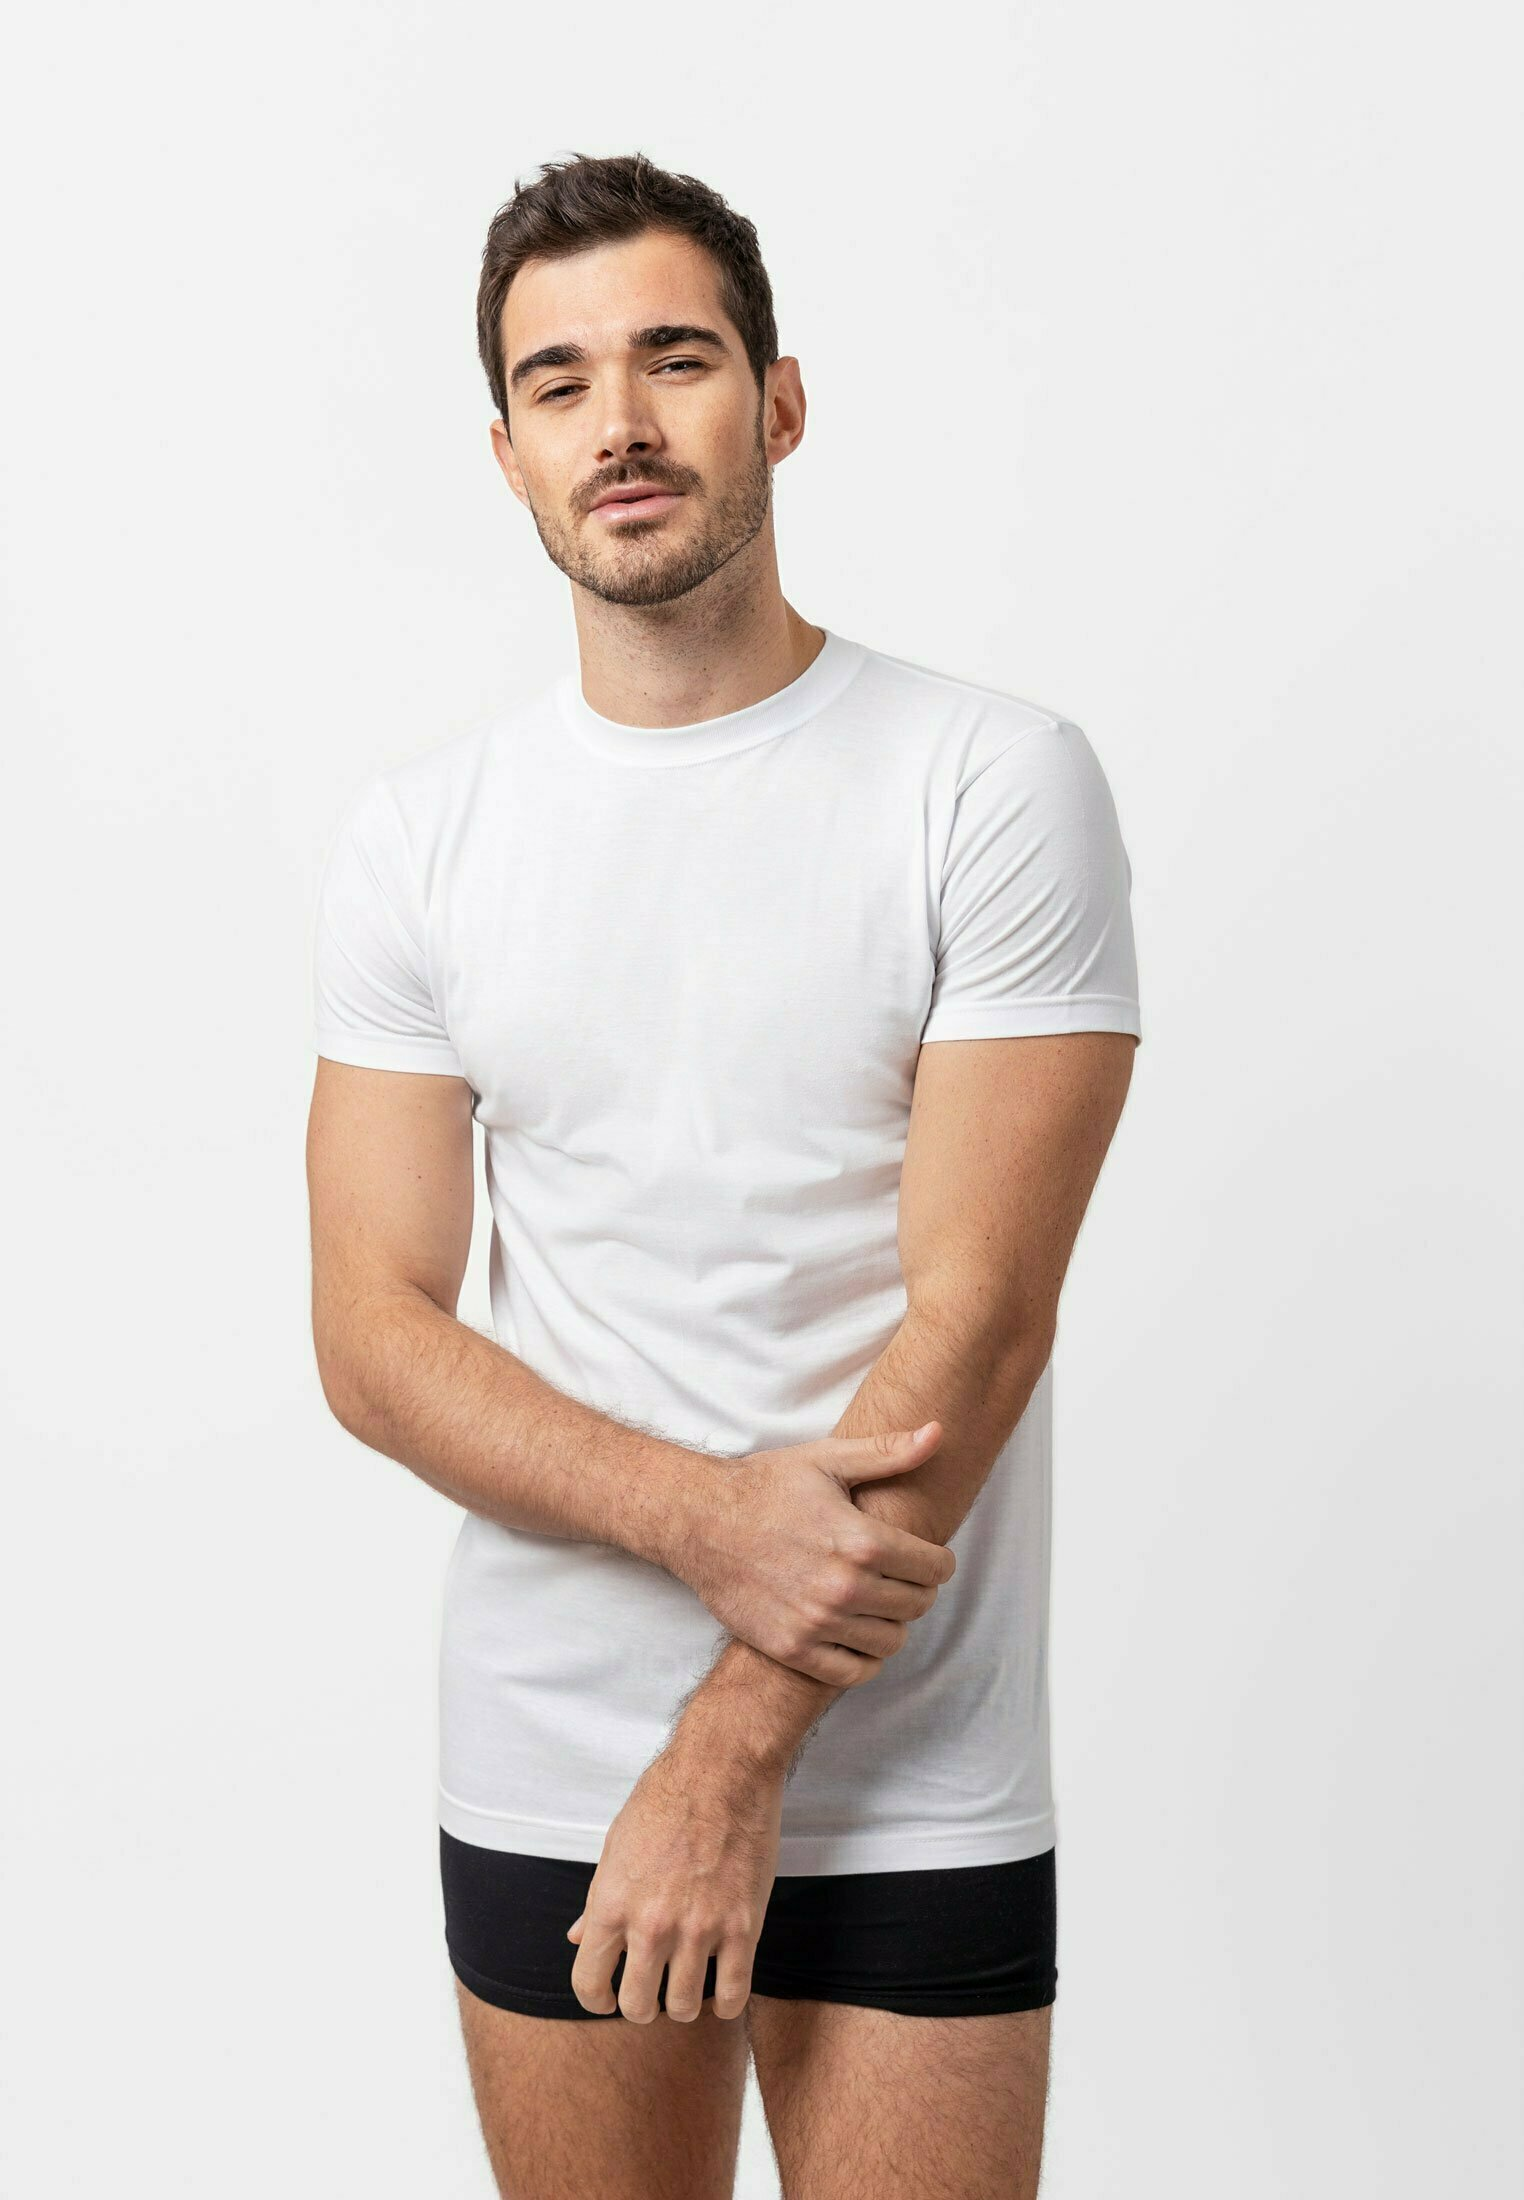 Herren ROUNDNECK - 3 PACK - Unterhemd/-shirt